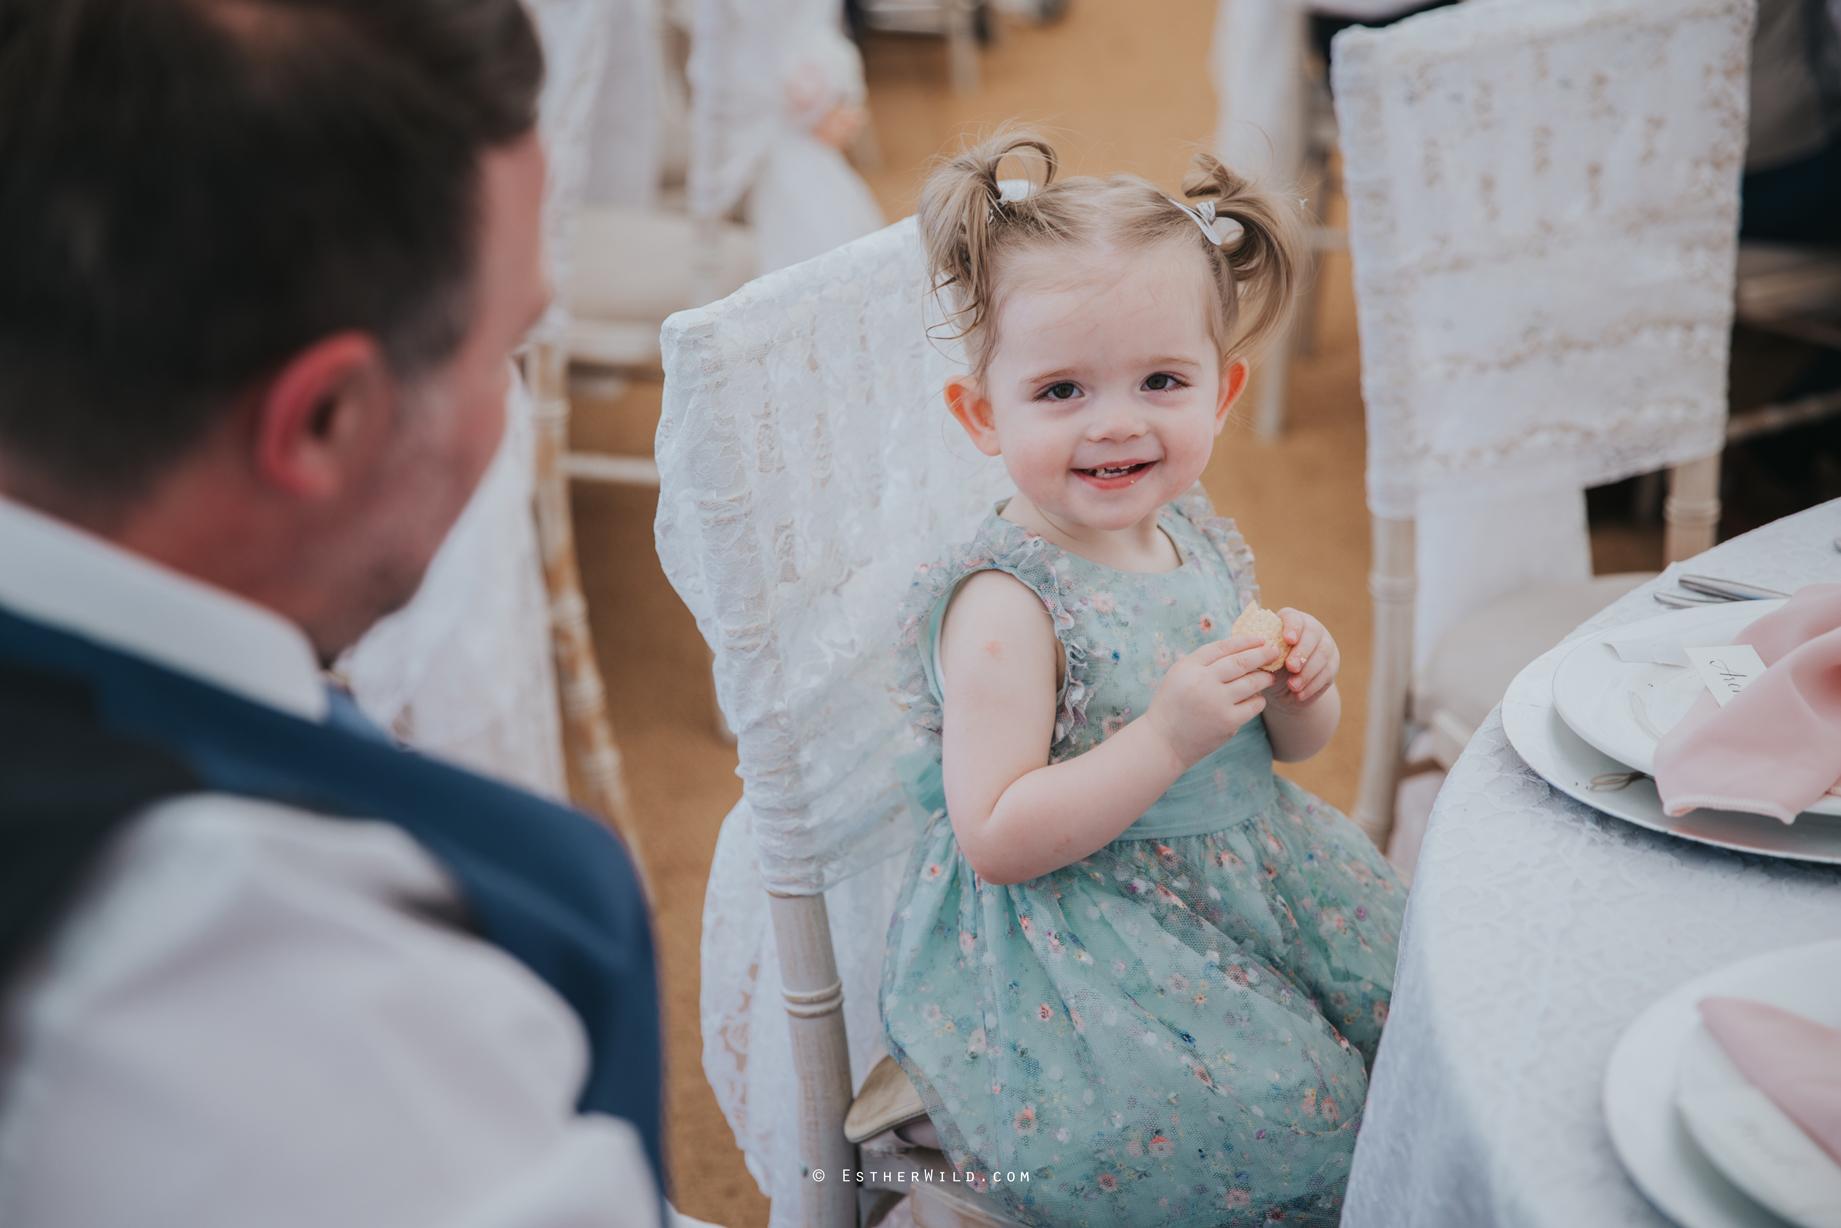 IMG_1603Walpole_St_Andrew_Church_Norfolk_Wedding_Copyright_Esther_Wild_Photographer_.jpg